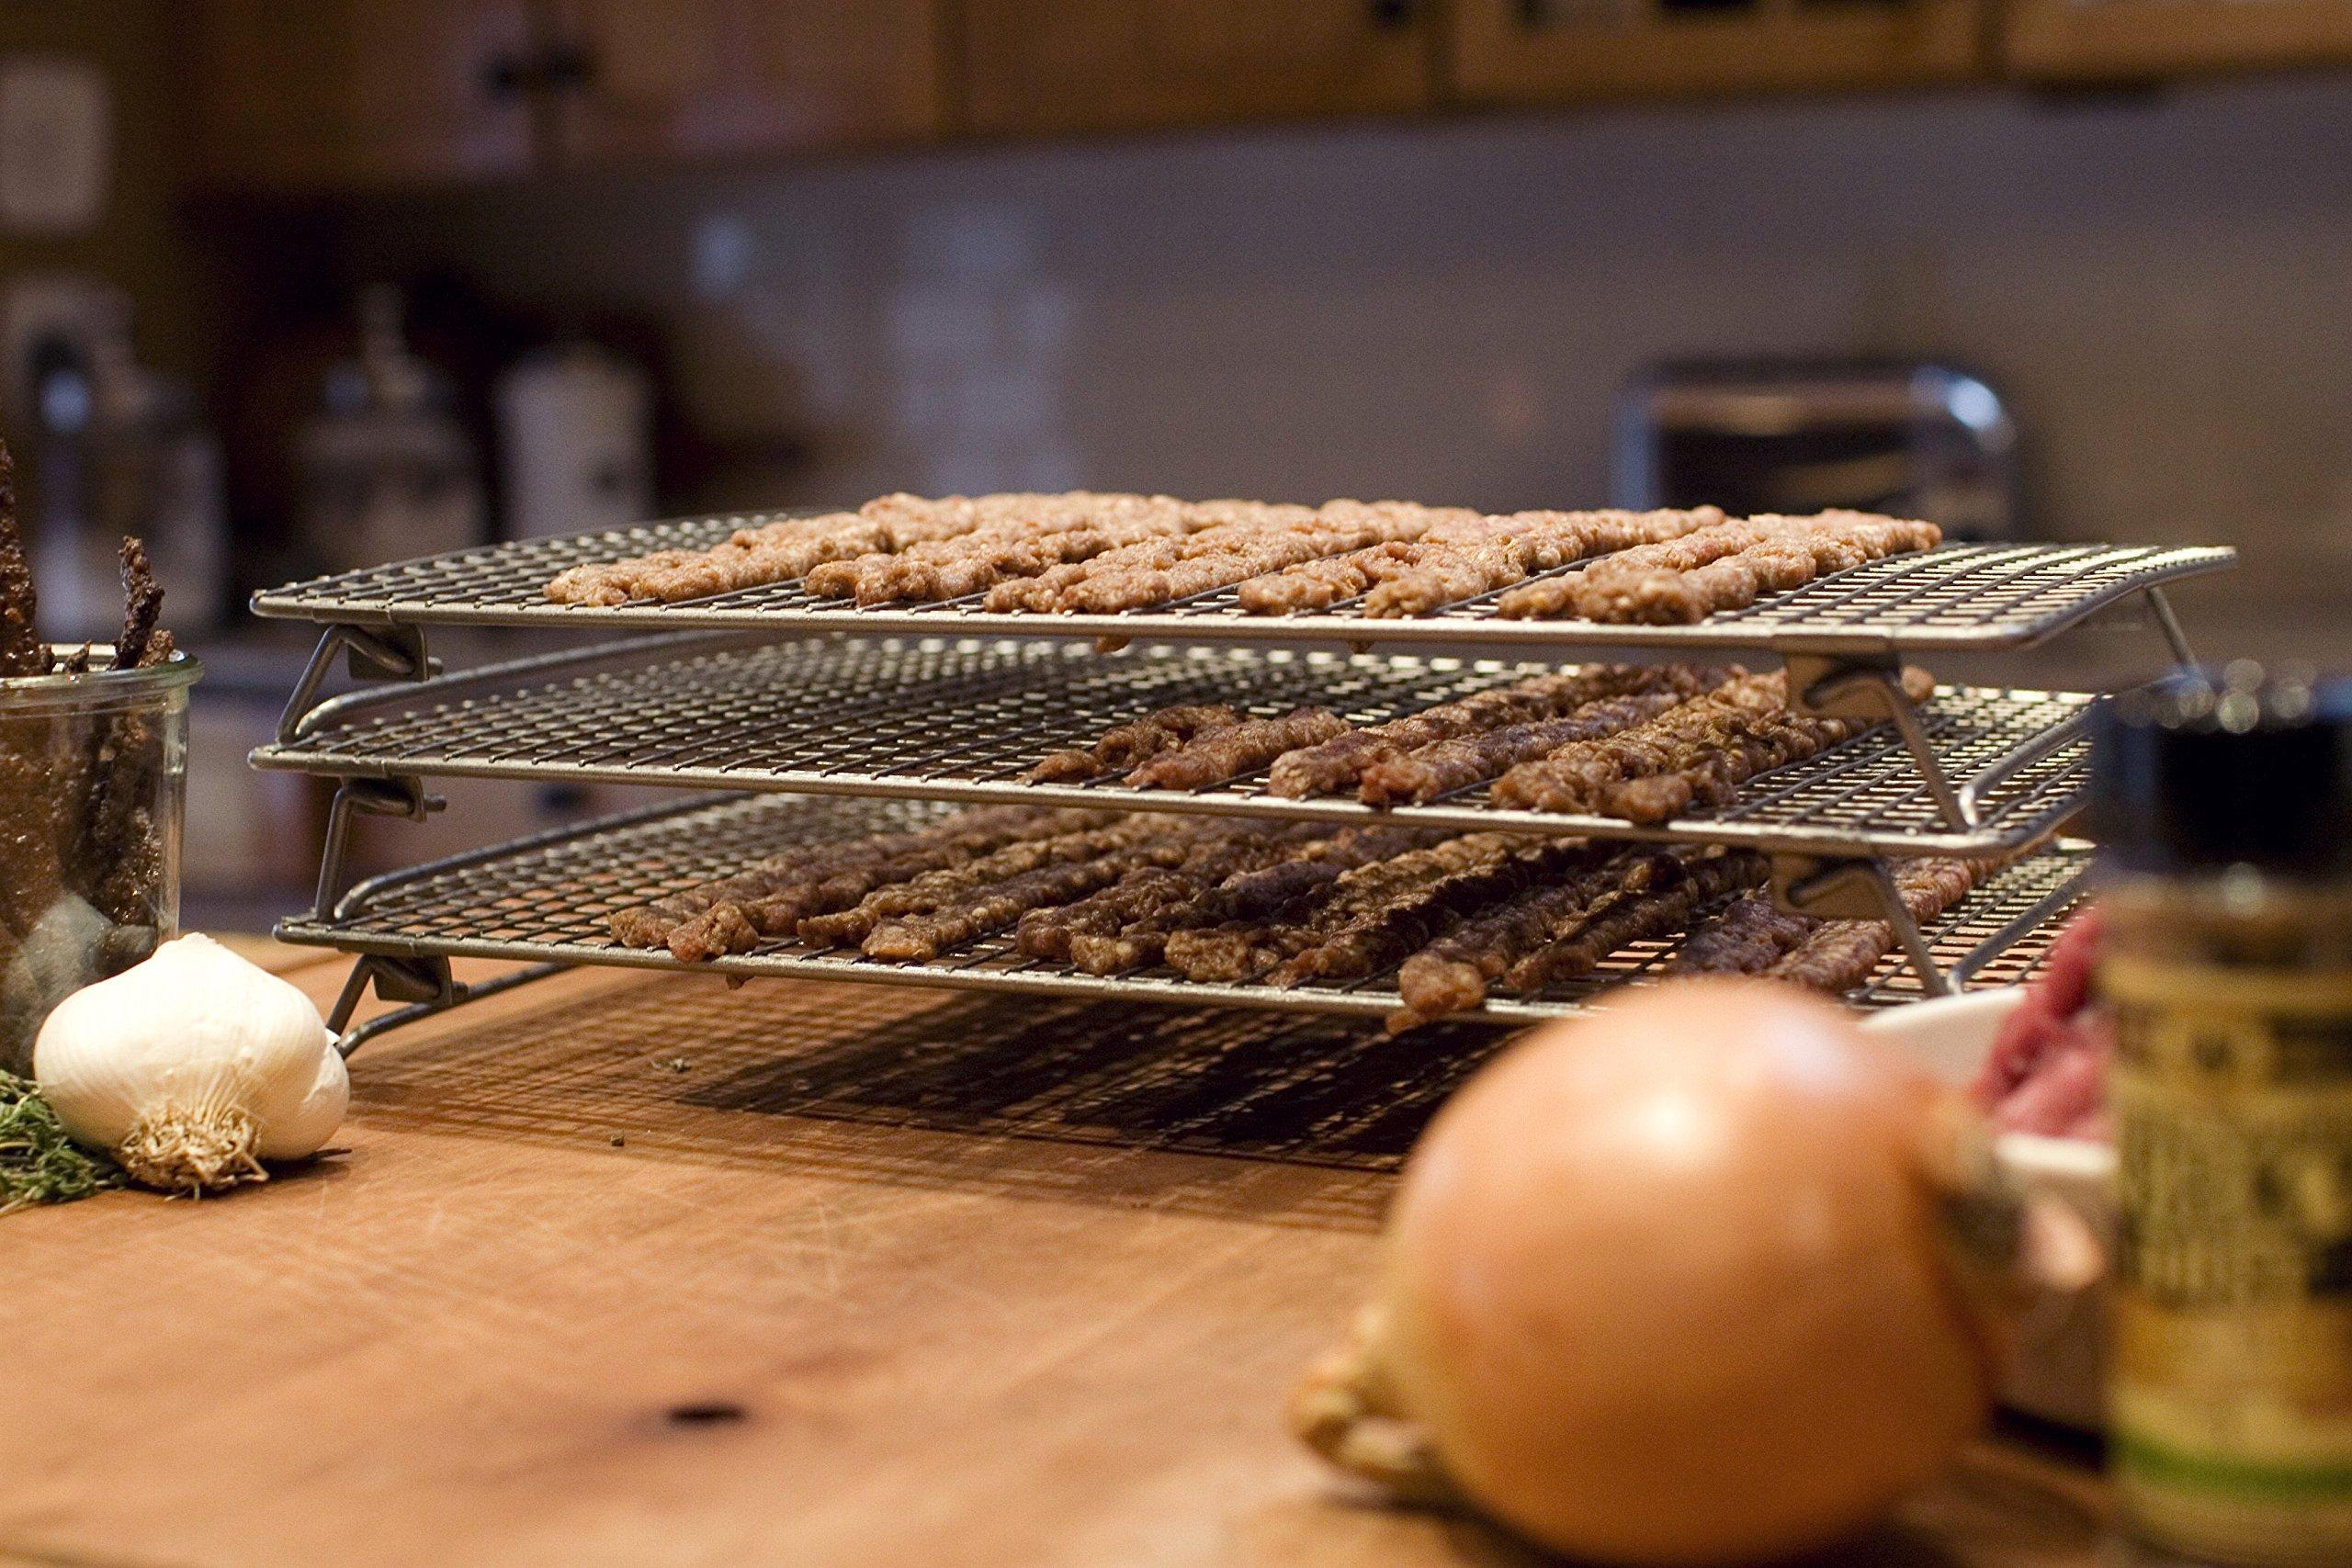 Weston Nonstick 3 Tier Drying Rack And Baking Pan 07 0155